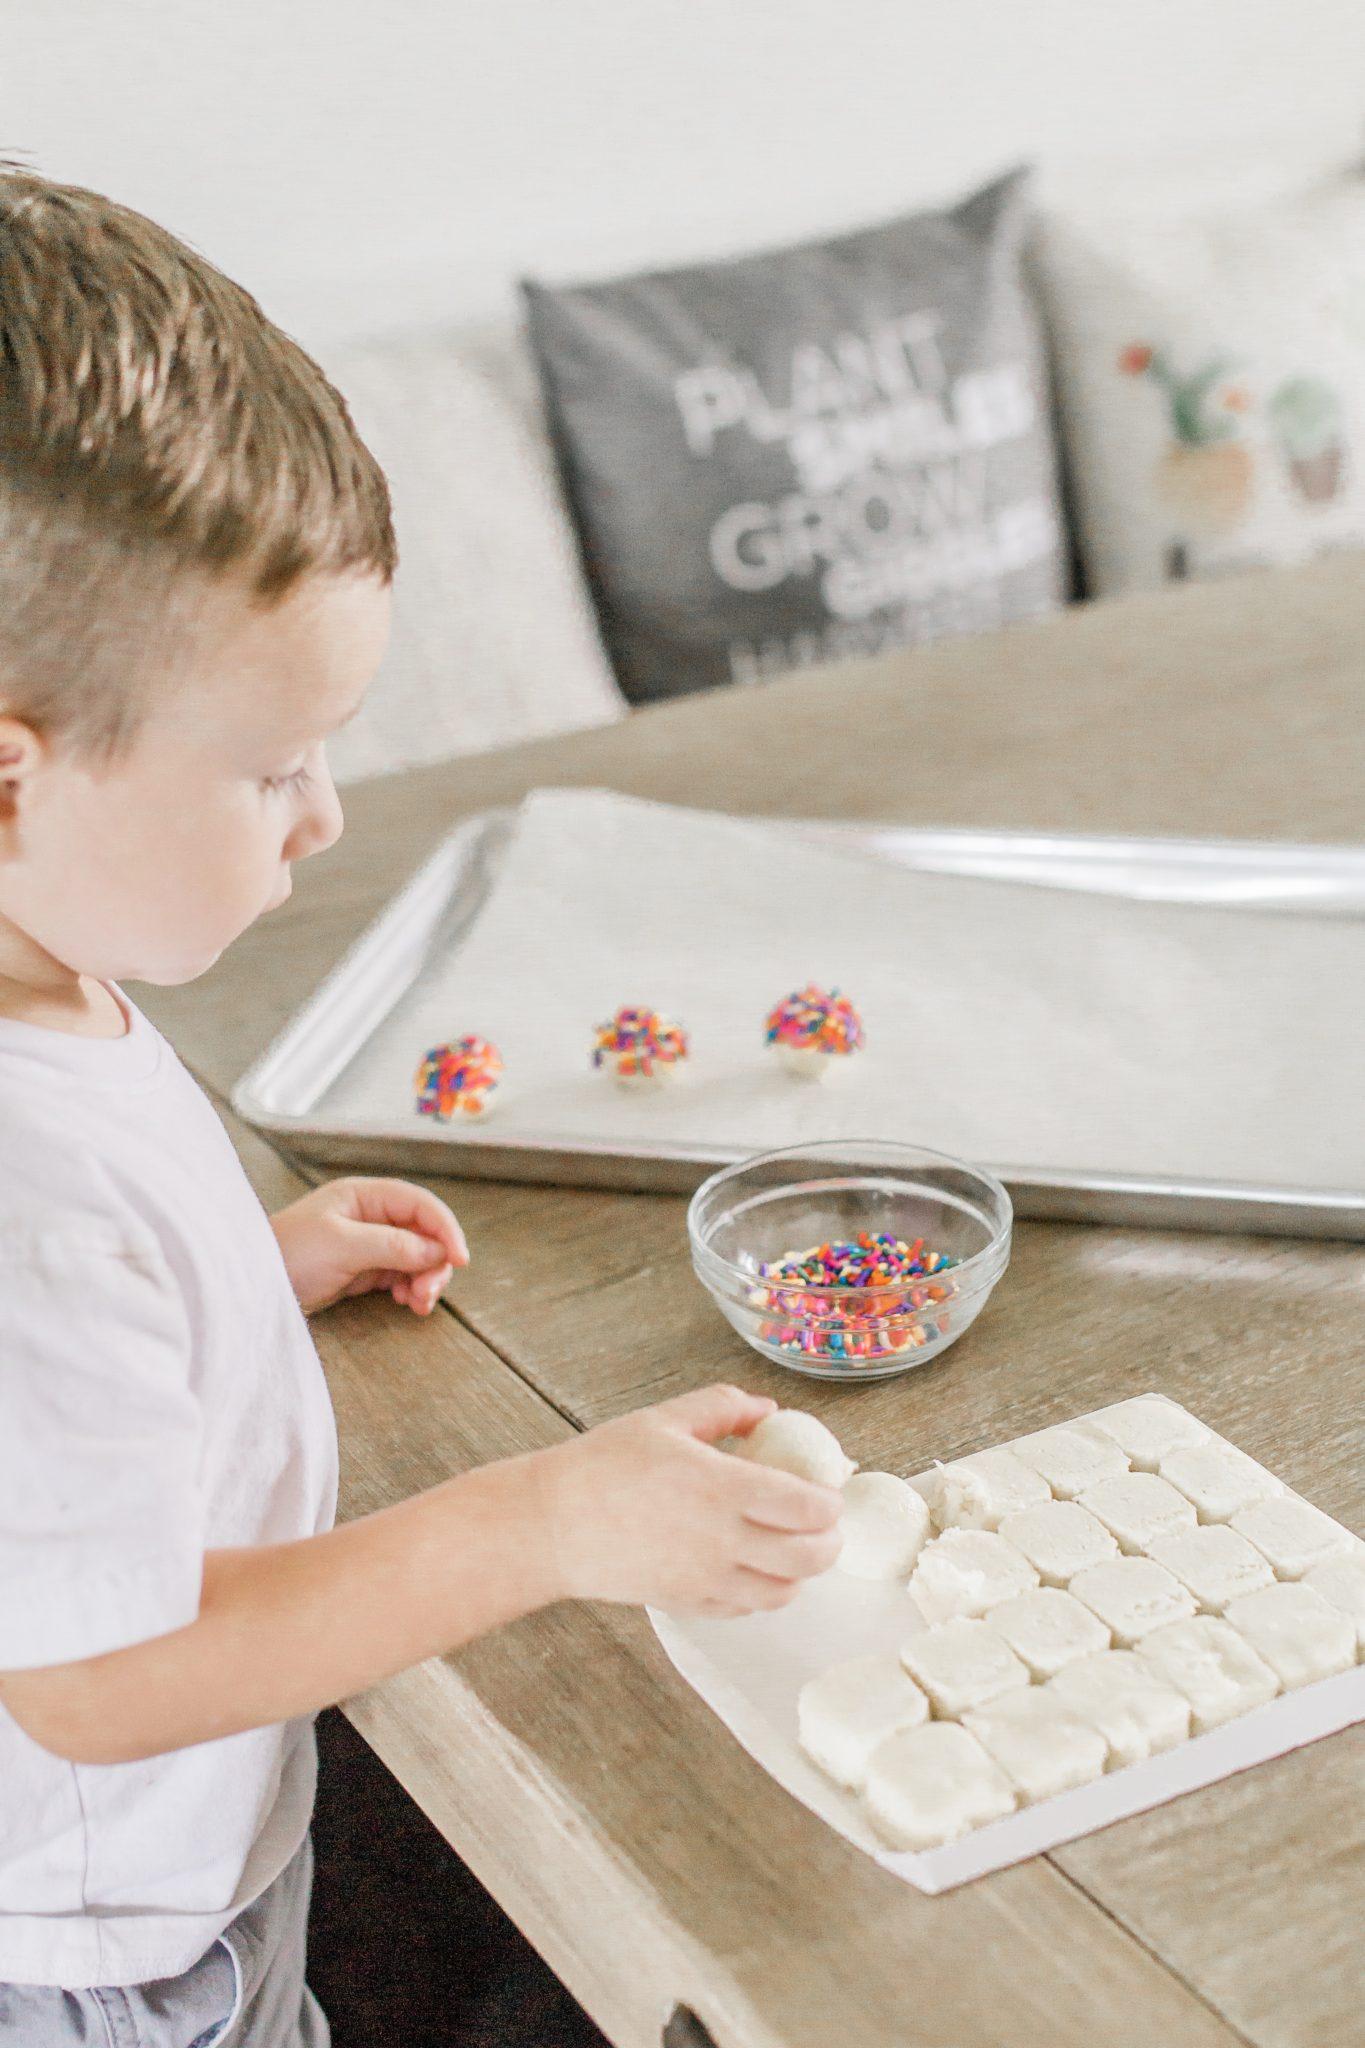 Publix Rainbow Sugar Cookies, copycat Publix sugar cookies, Tampa parenting blog mothers blog motherhood blog Florida travel blogger travel influencer healthy mom blogger spring hill florida lifestyle parenting blog best mom blog 2018